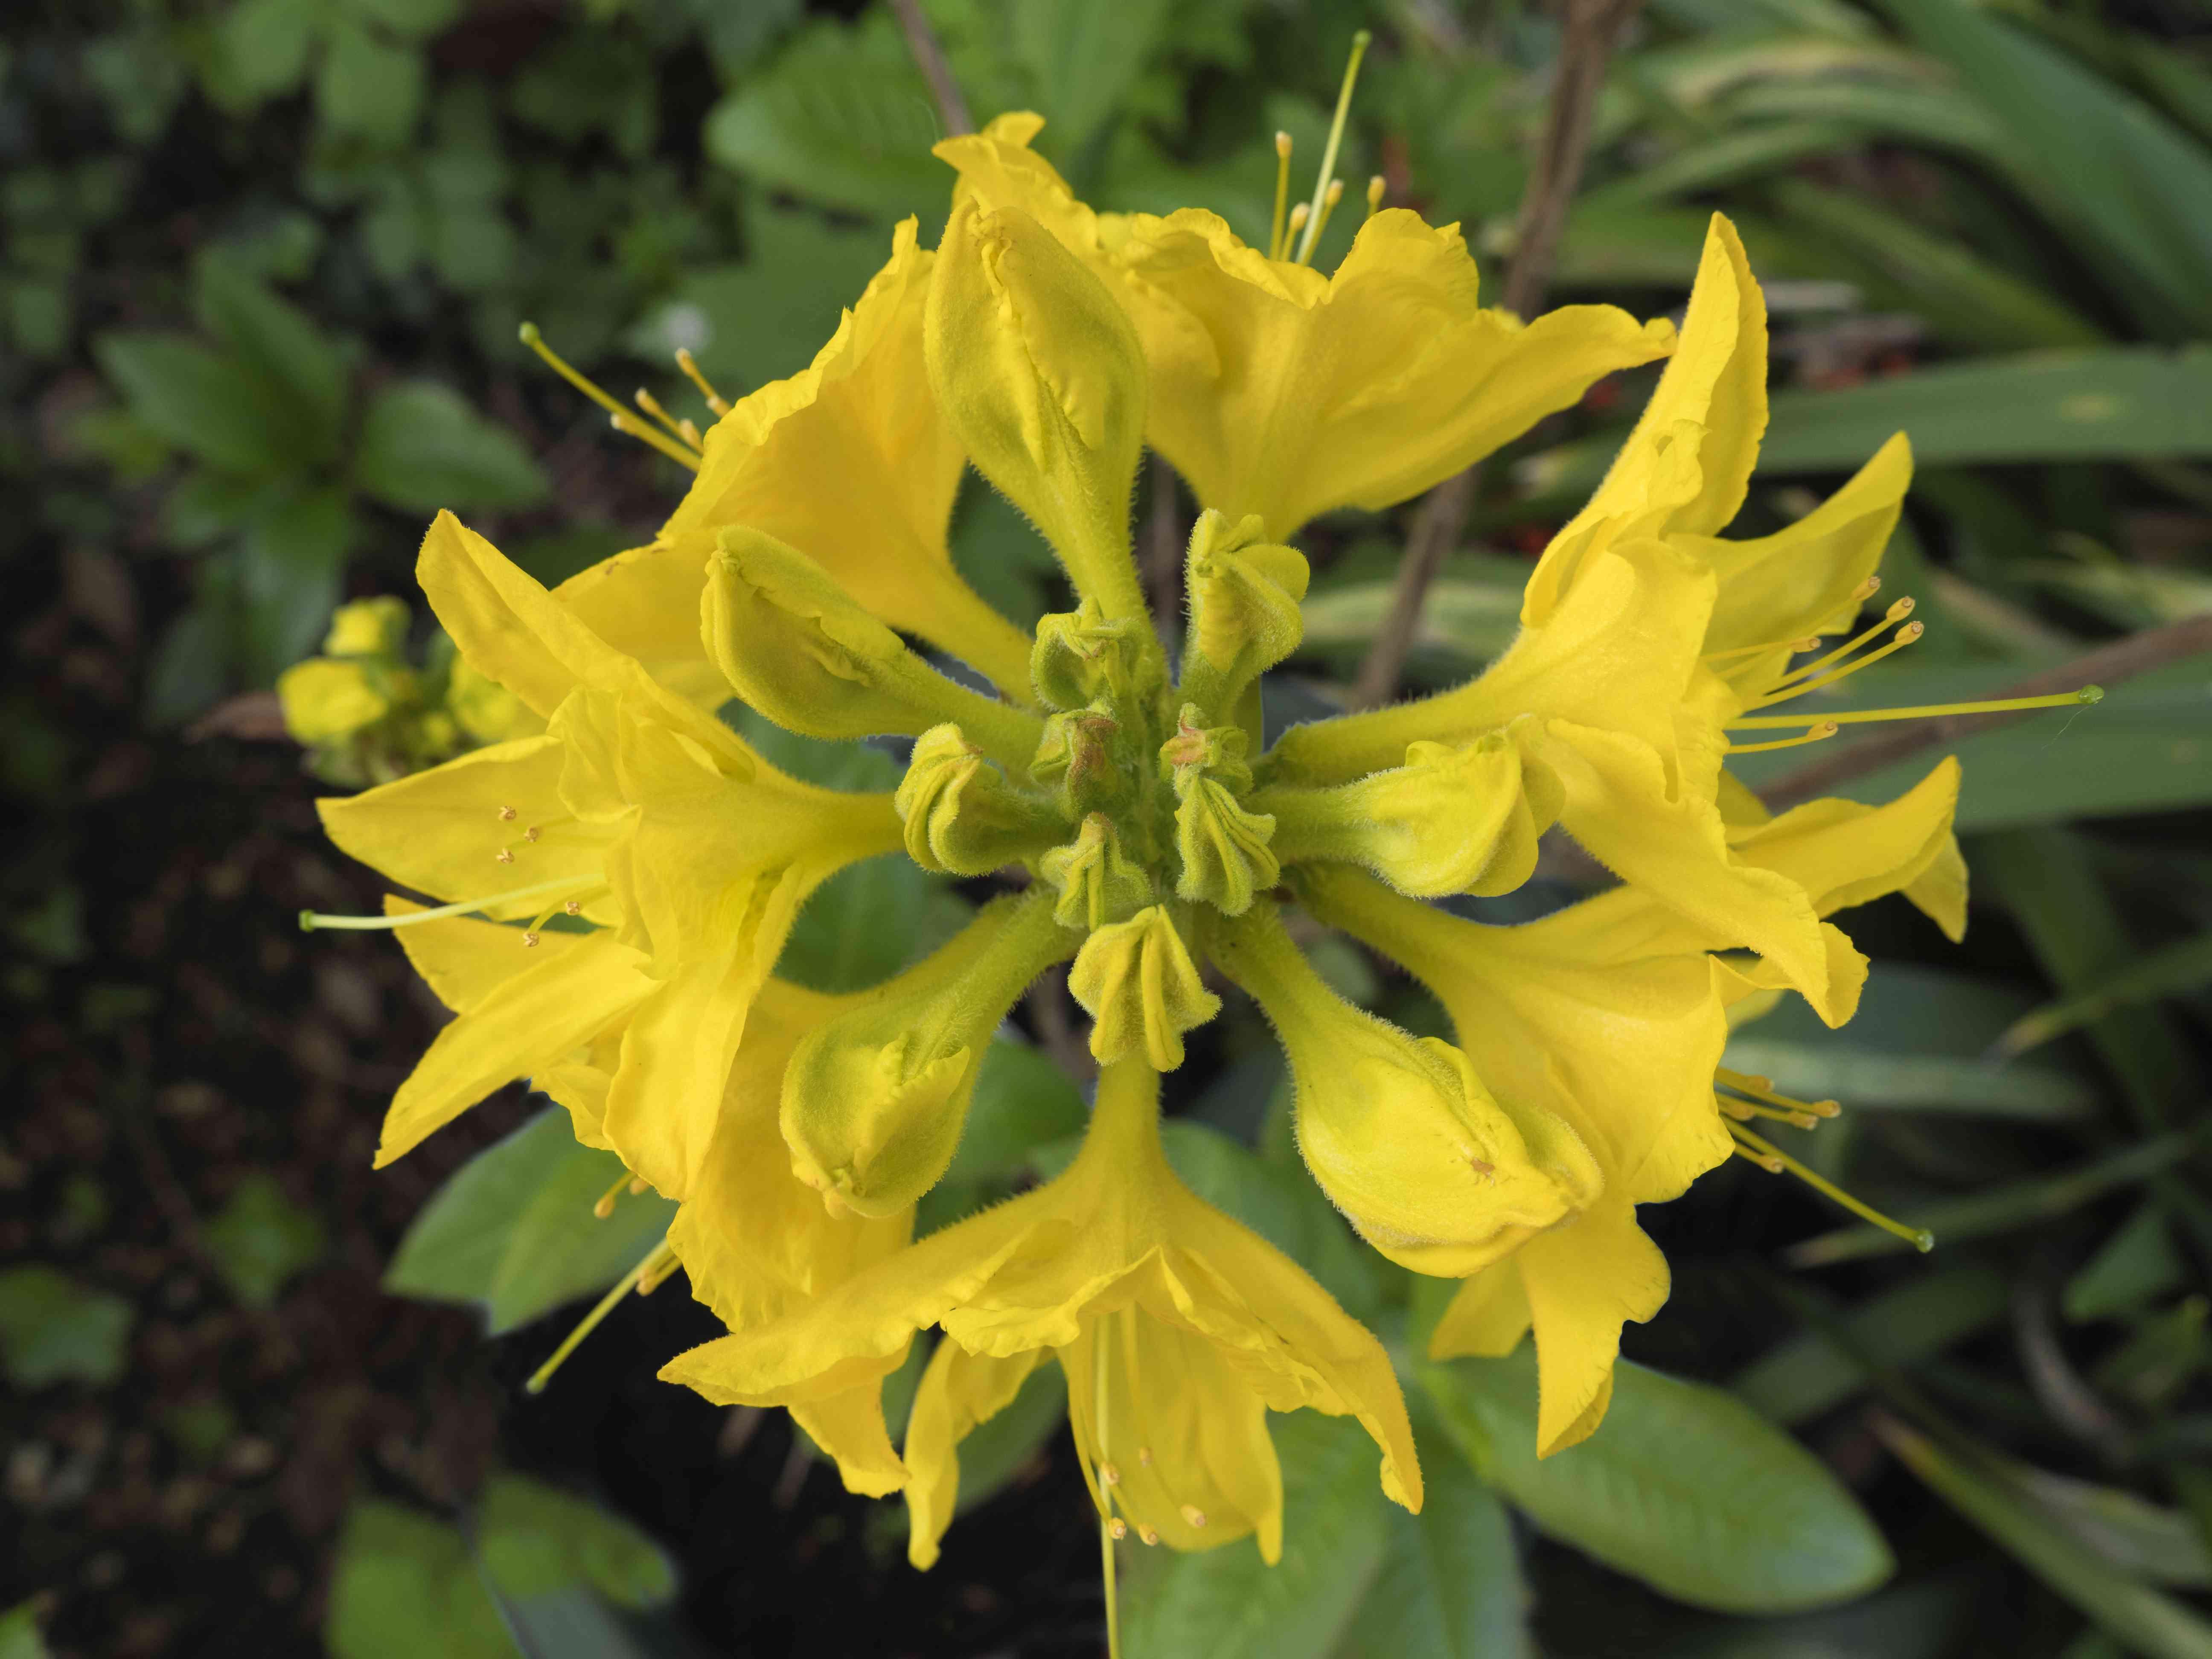 The 'Lemon Lights' azalea with yellow flowers